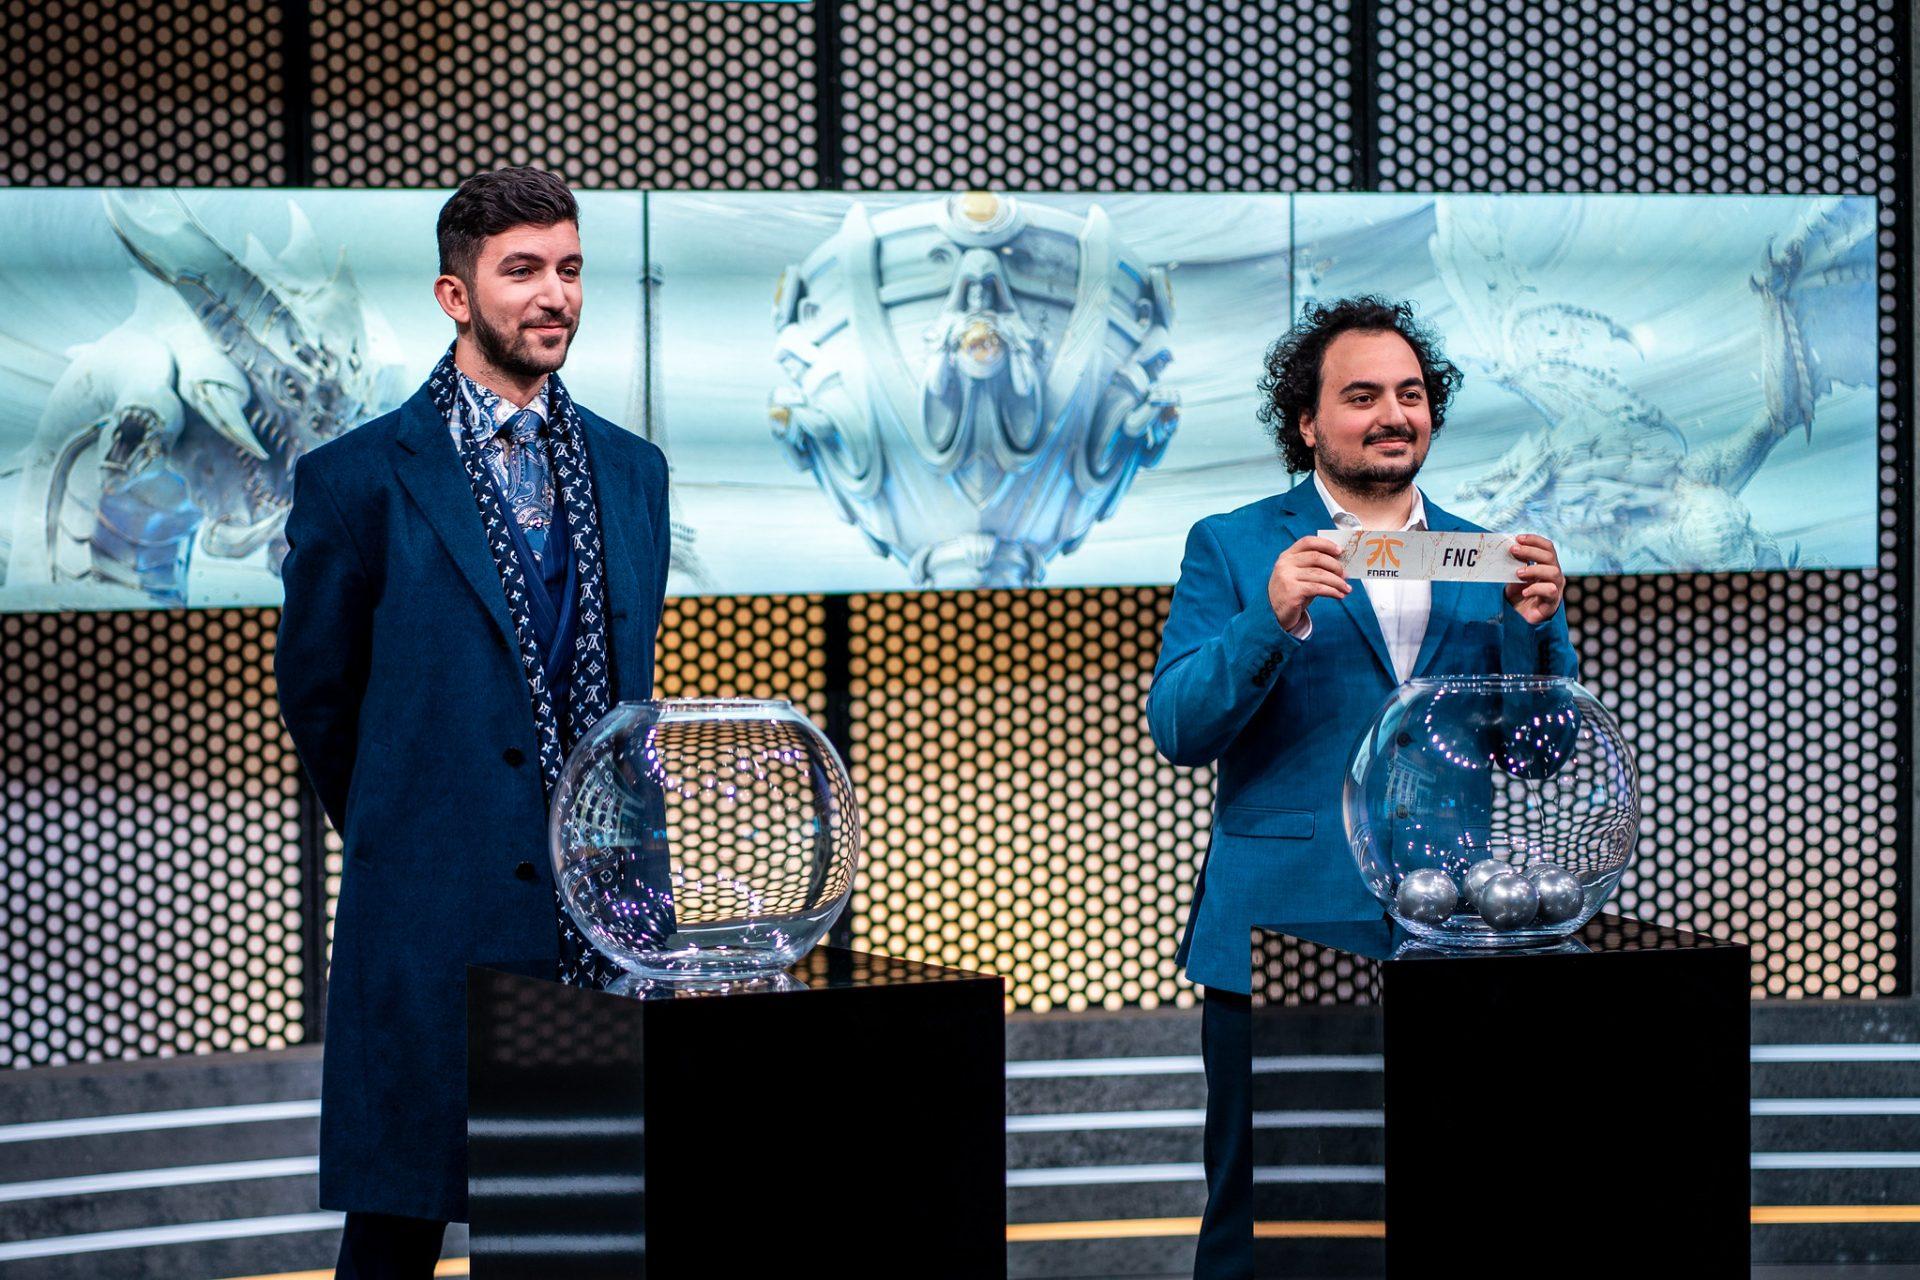 league-legends-worlds-2019-groups-draw